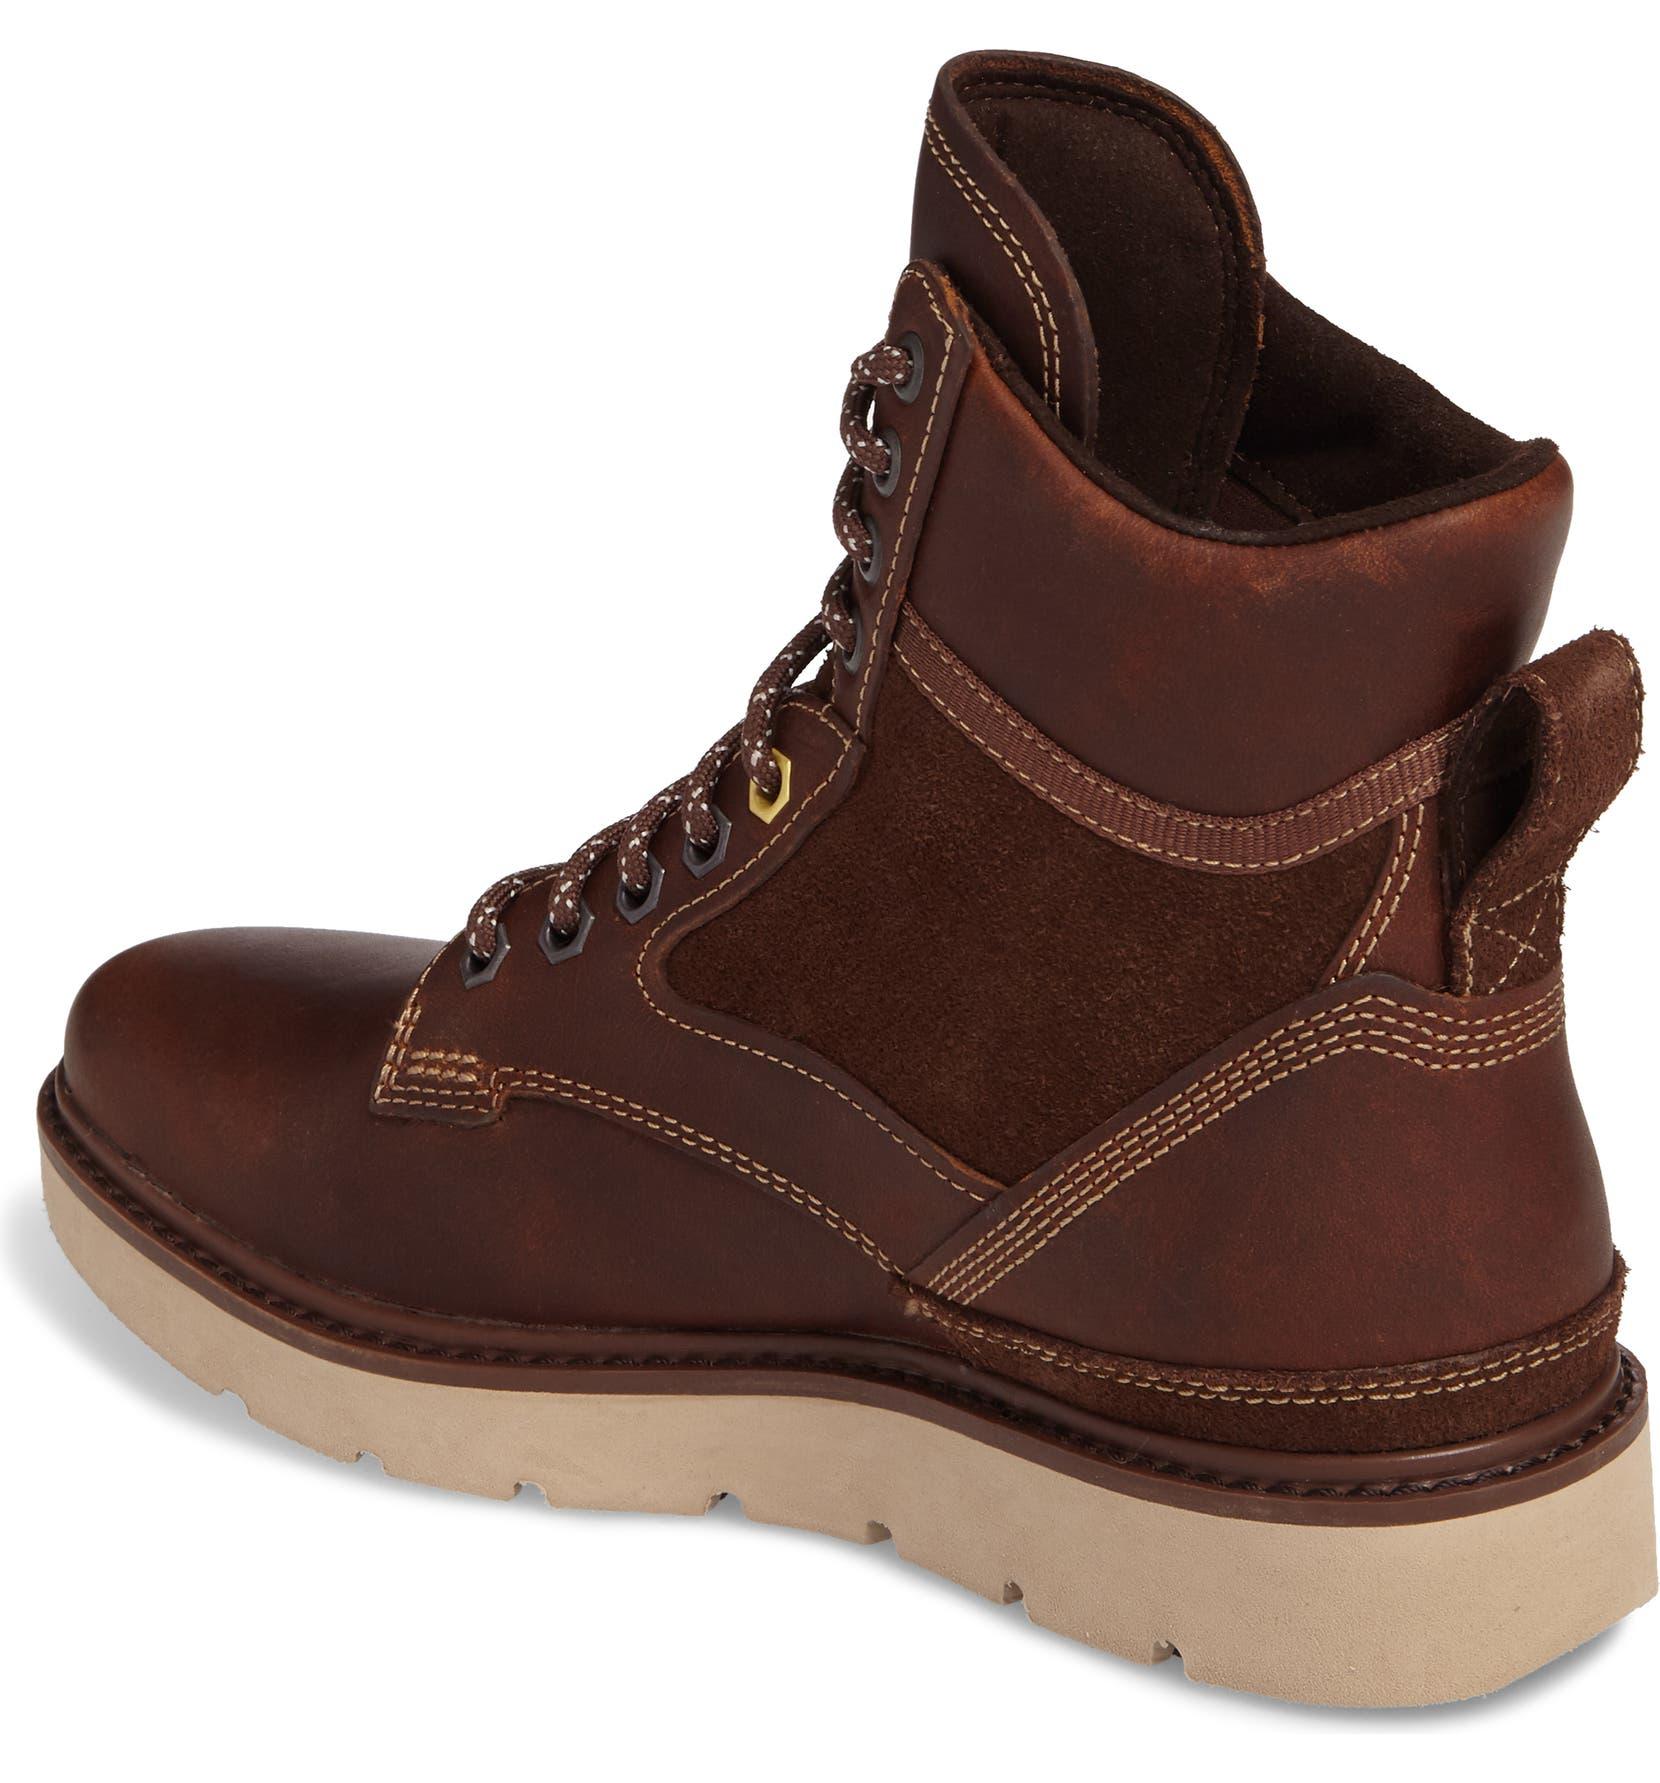 Kenniston Waterproof Mid Hiking Boot